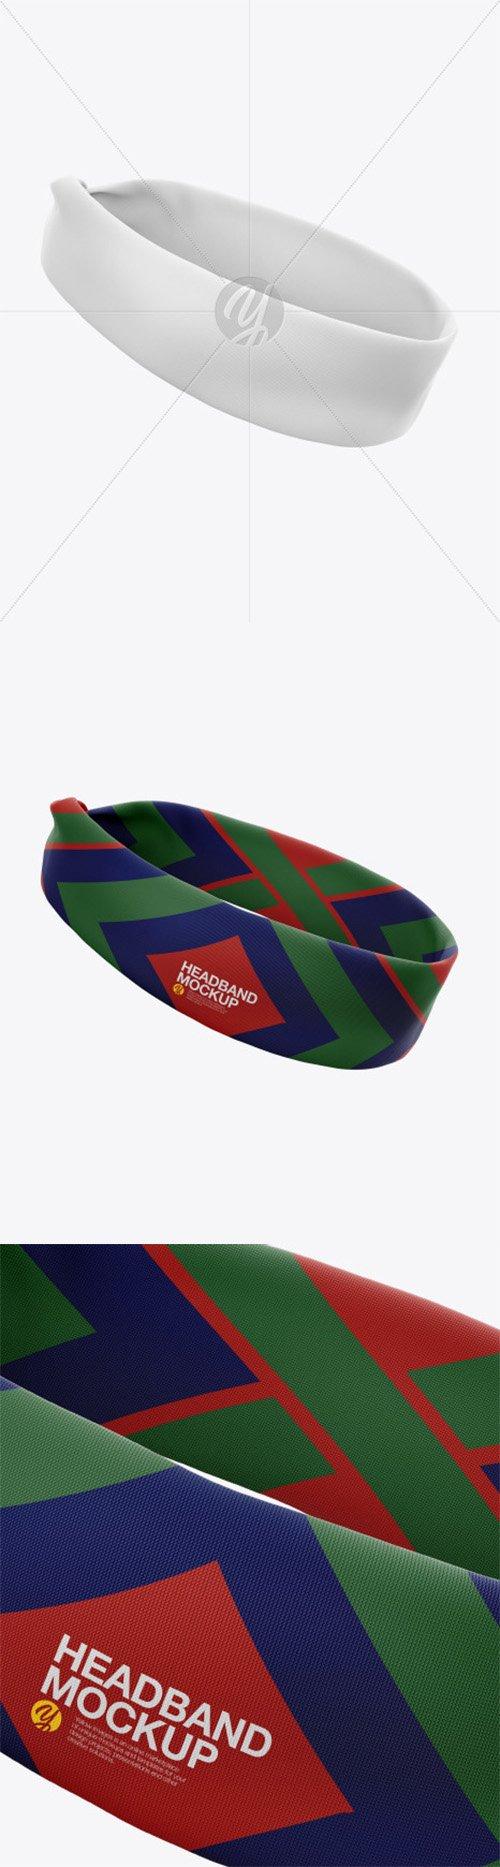 Headband Mockup 52449 TIF